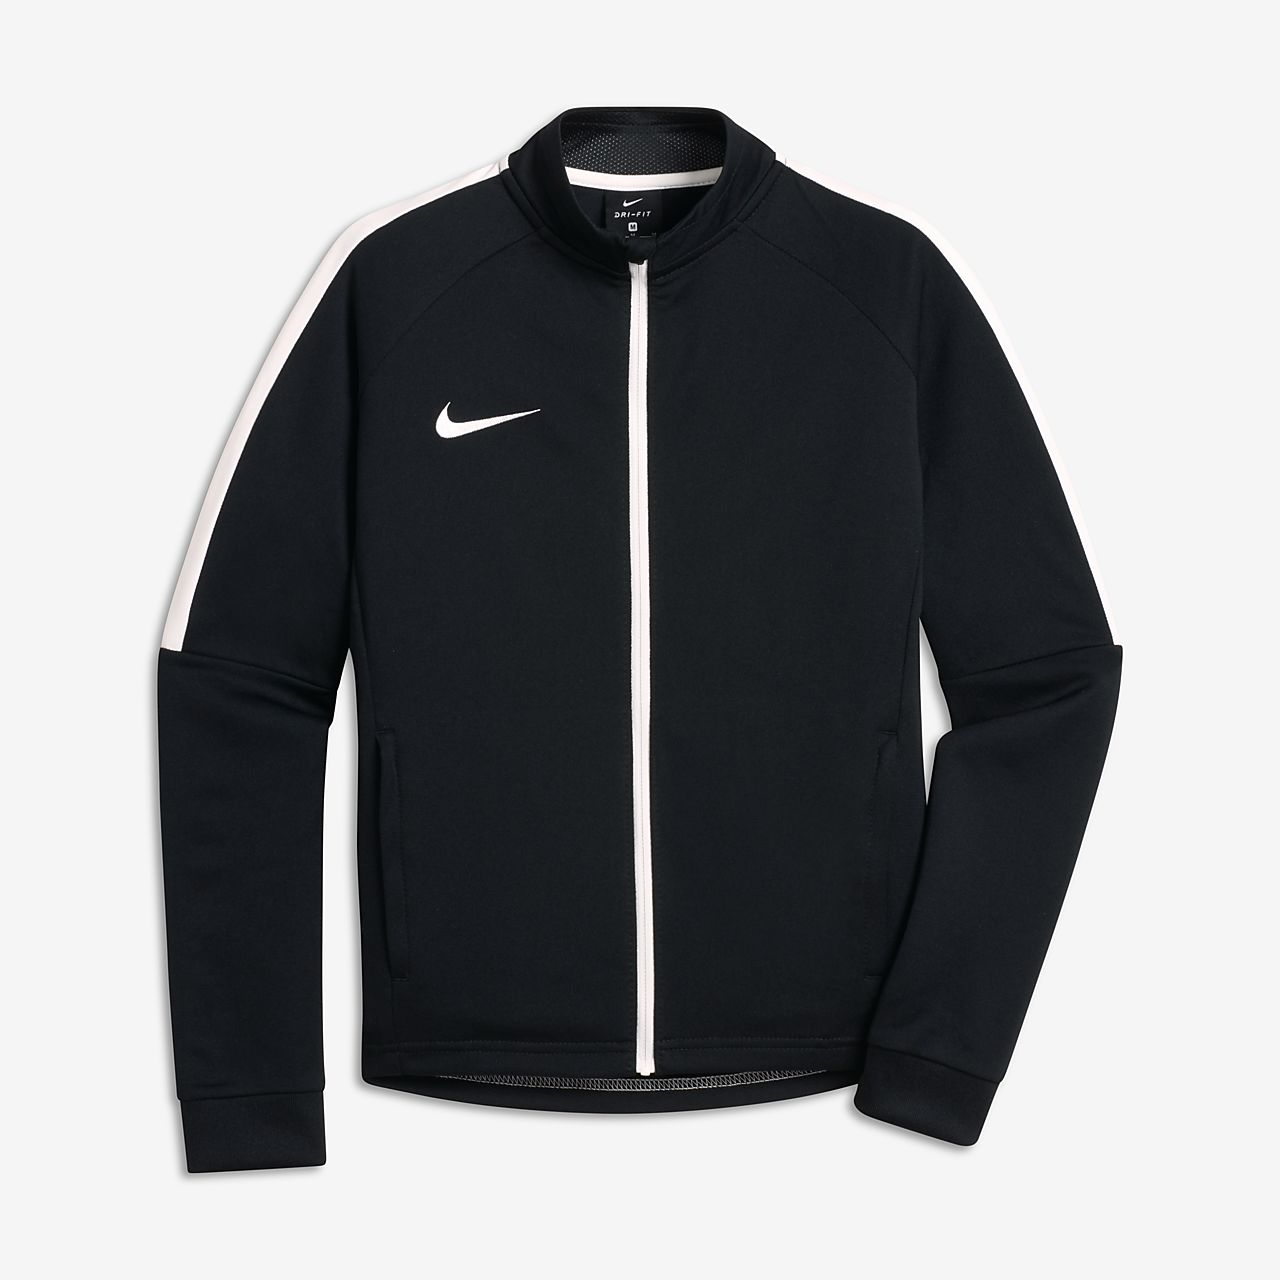 ... Nike Dri-FIT Academy Older Kids' Football Track Suit